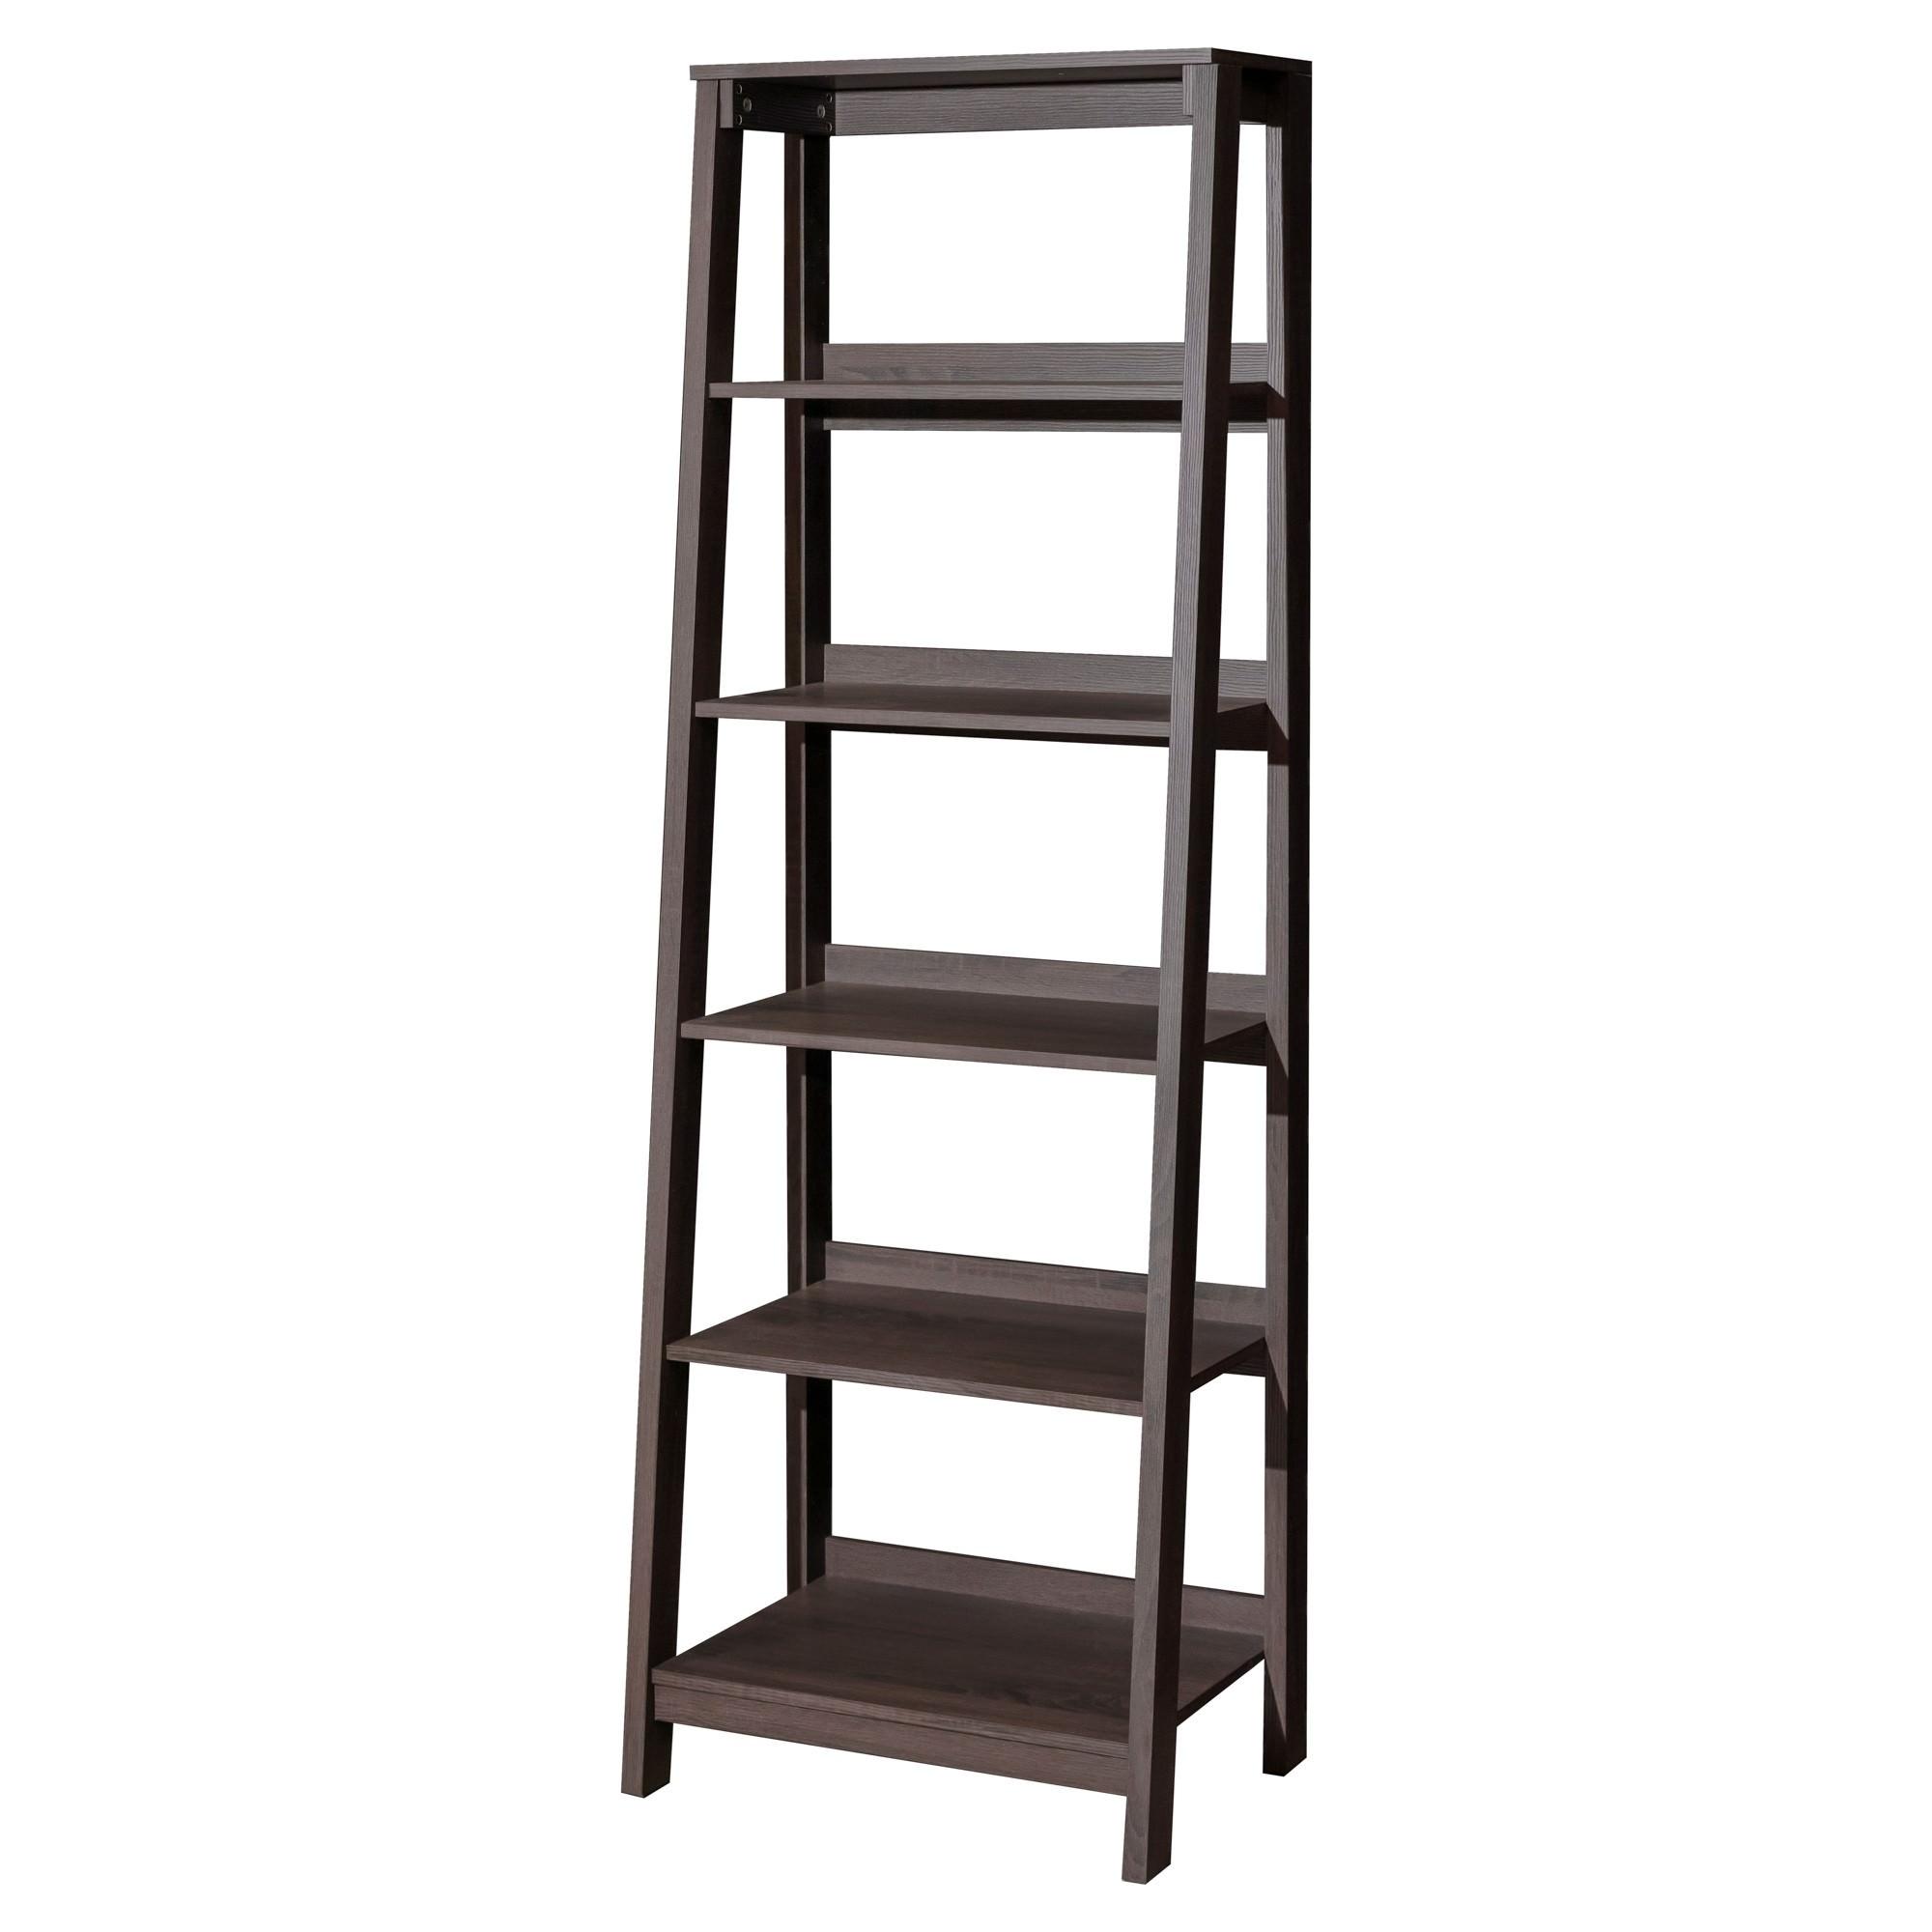 Florentine Ladder Display Shelf